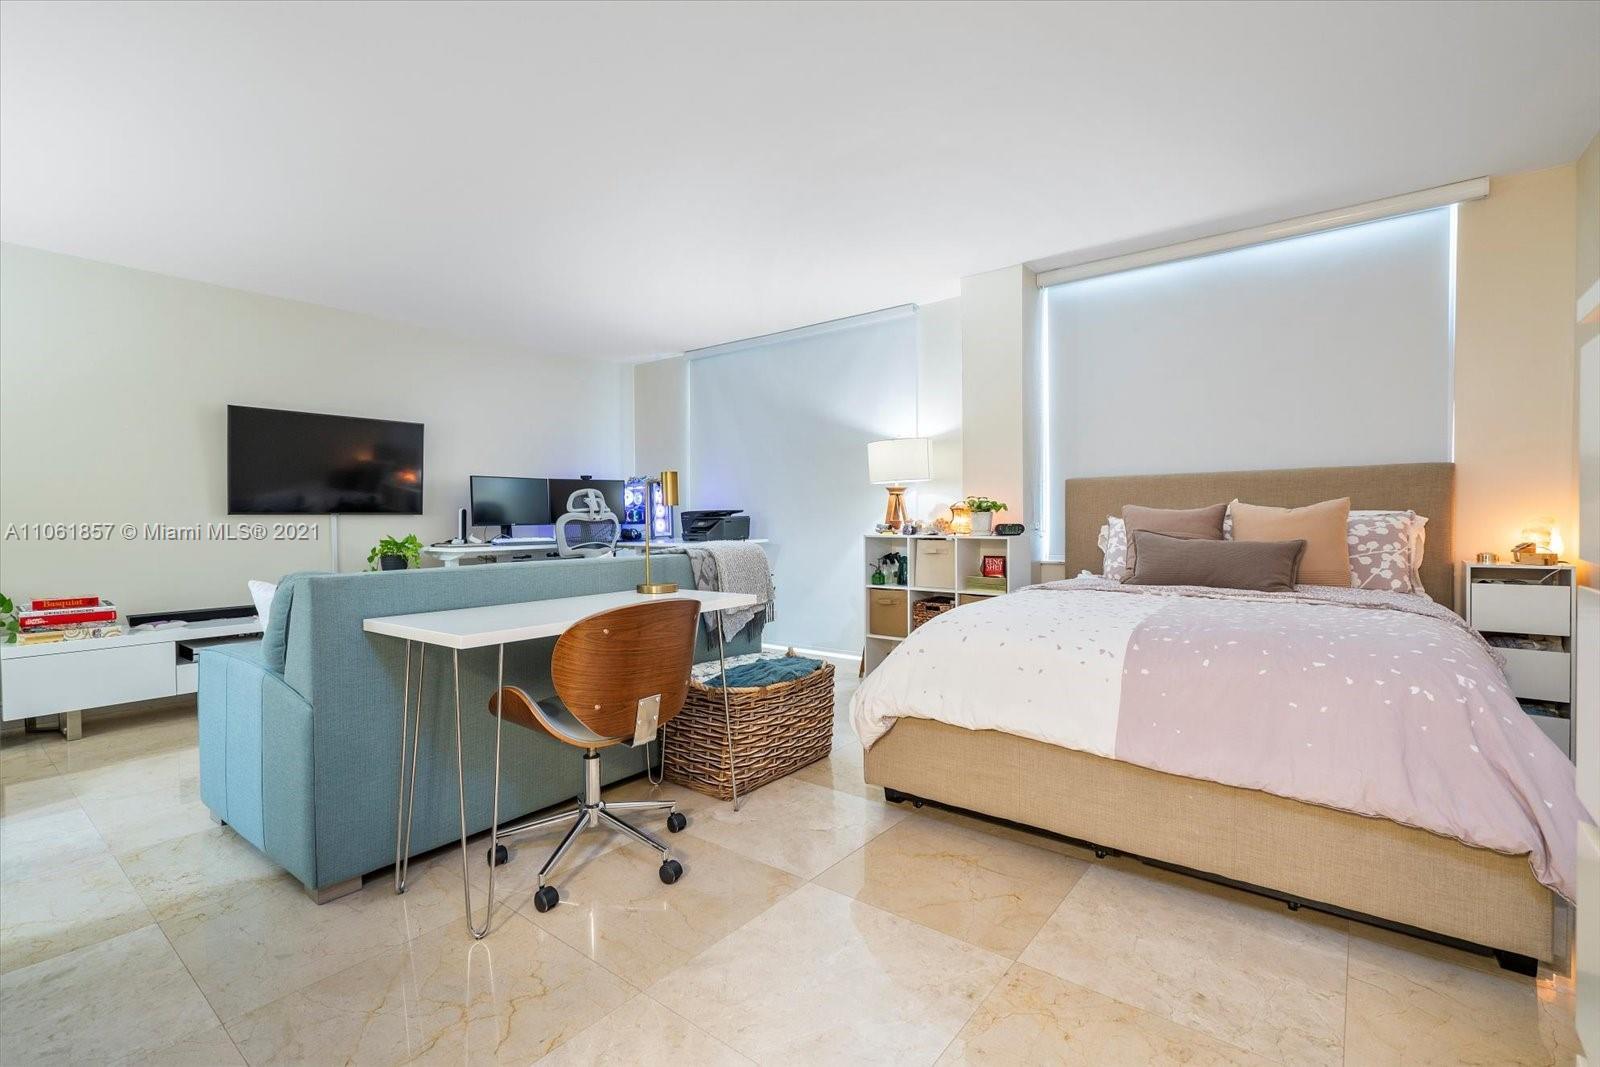 Oceanside Plaza #5P - 5555 Collins Ave #5P, Miami Beach, FL 33140